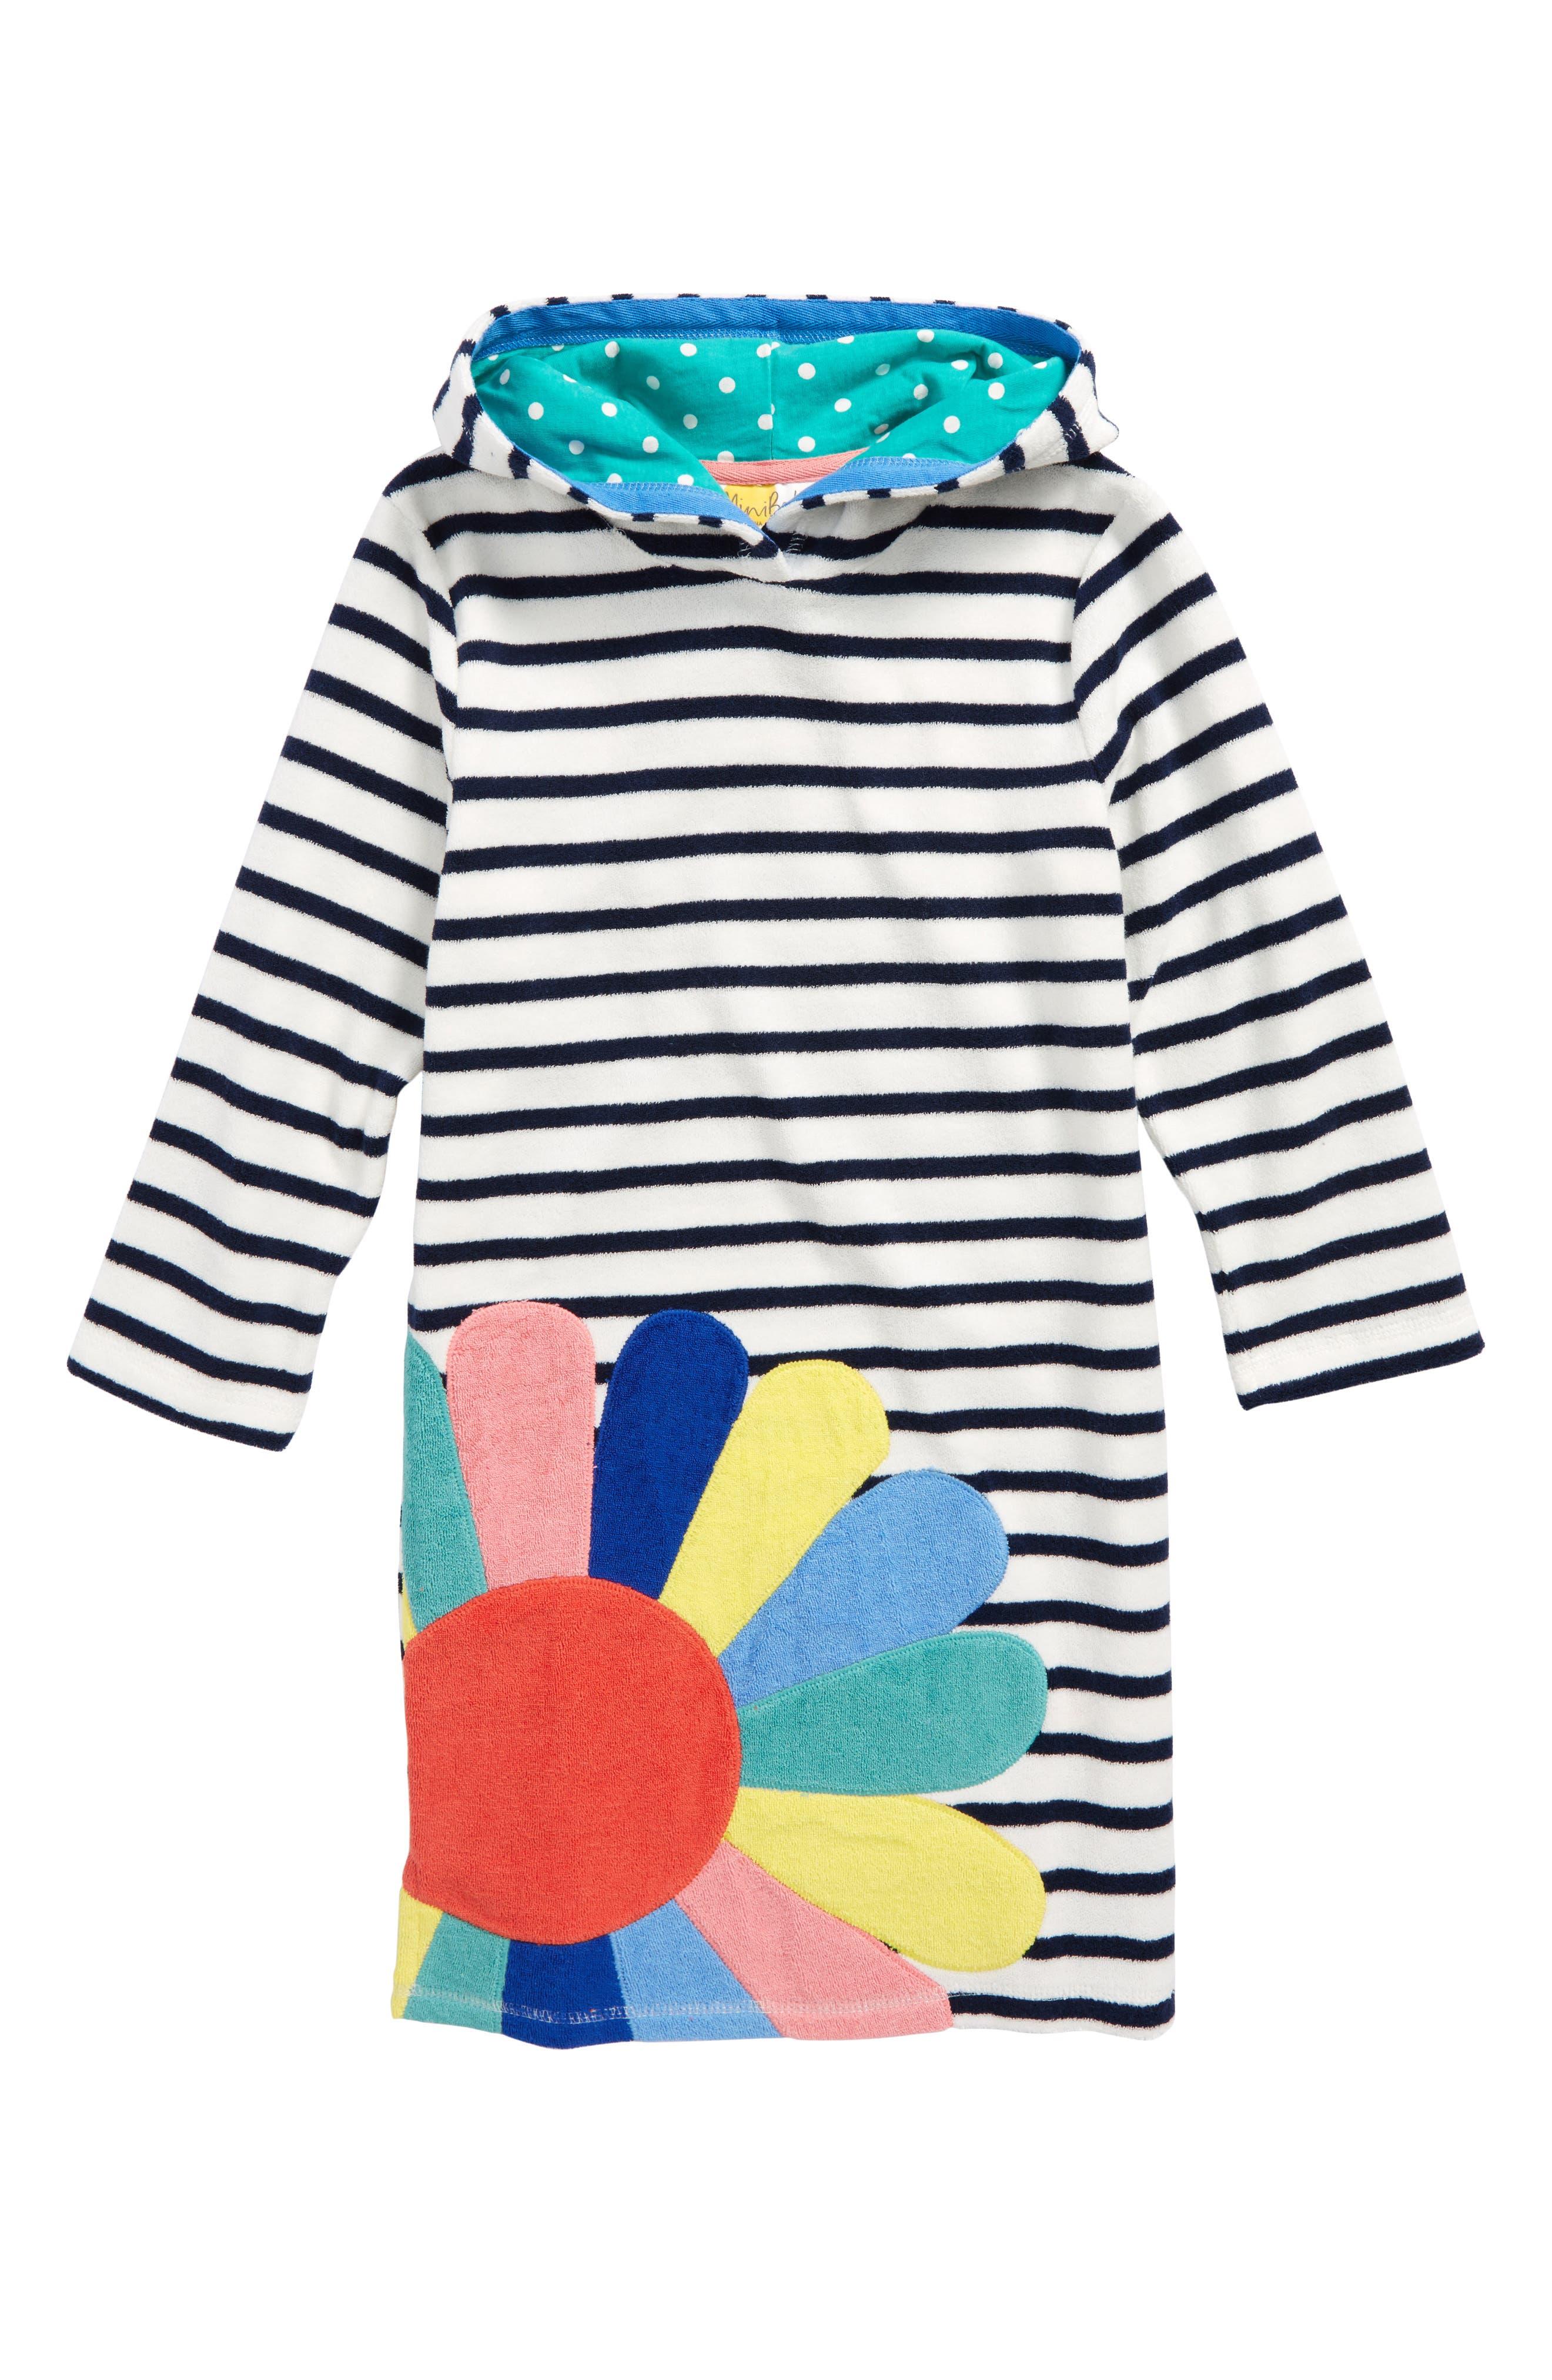 Appliqué Toweling Beach Dress,                         Main,                         color, Ivory/ School Navy Nav